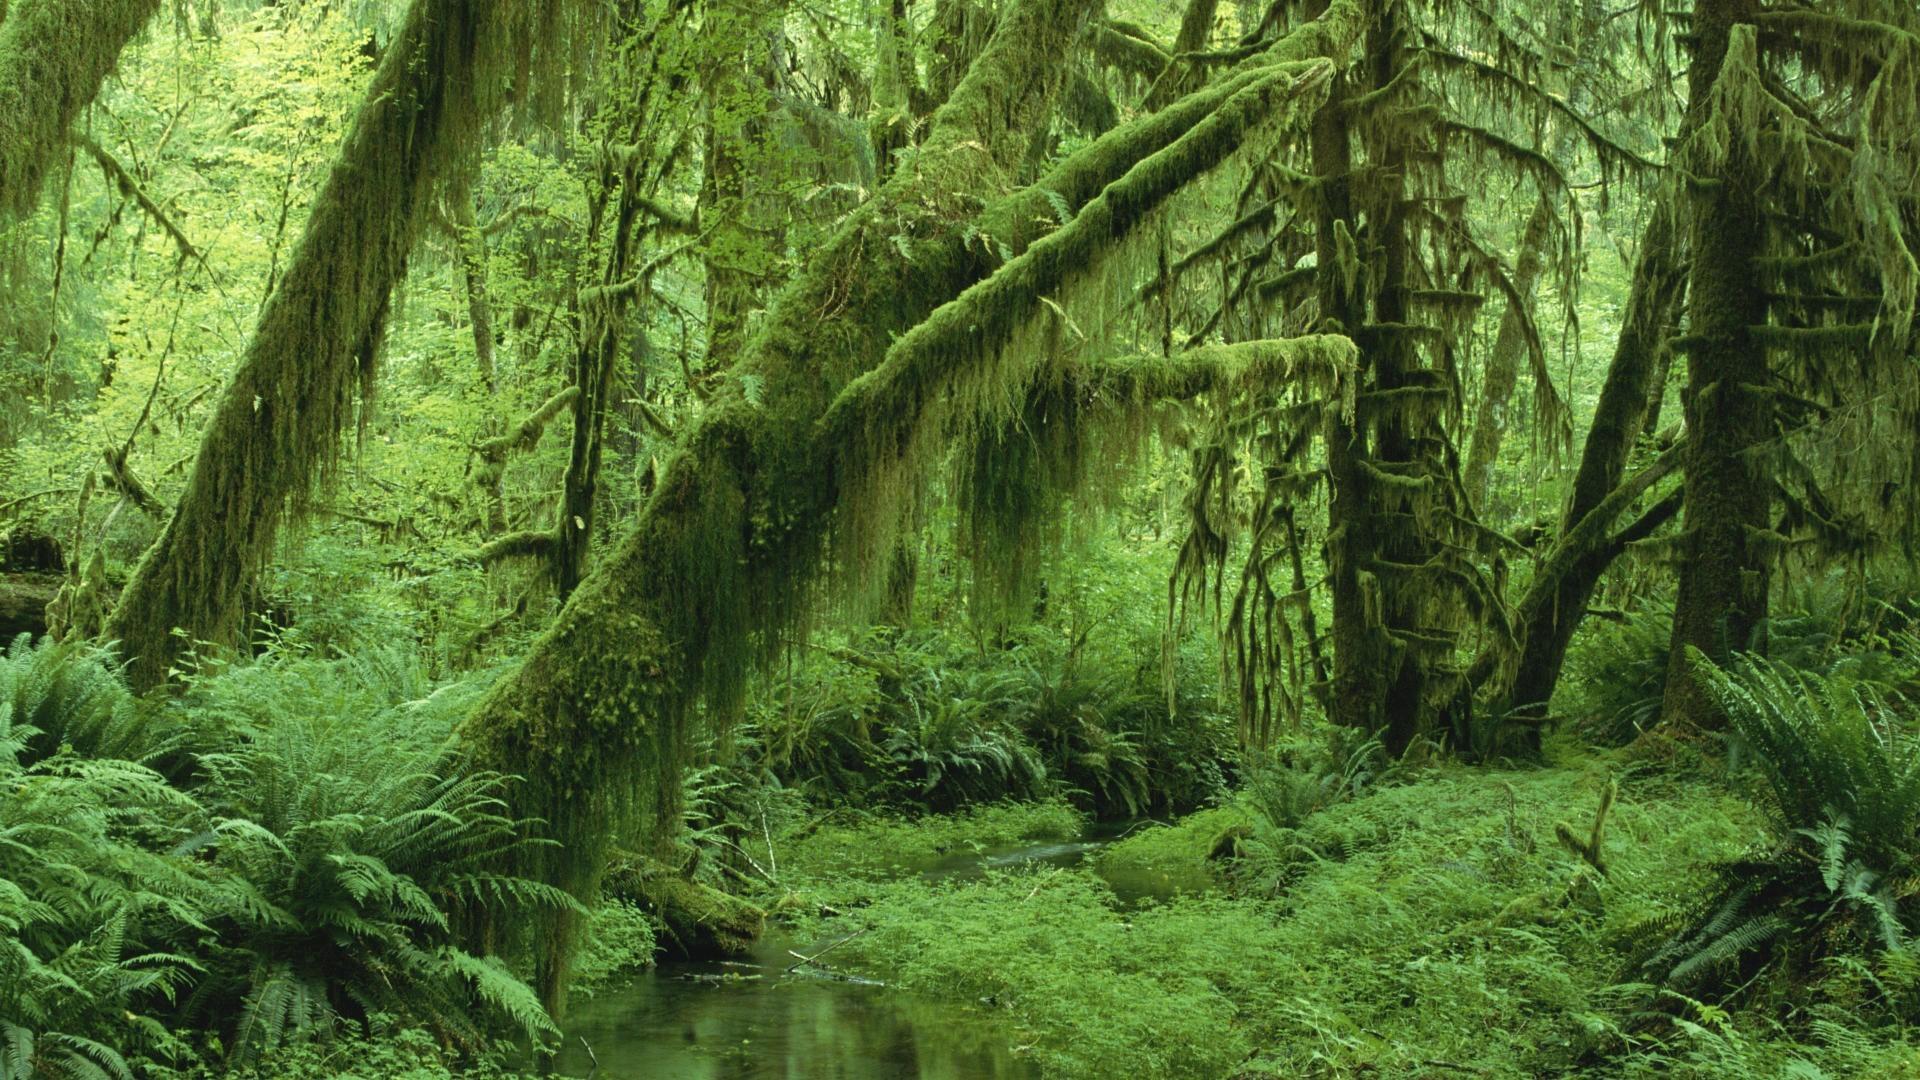 Rainforest Beauty Blue Sea Wallpaper Red ~ Rainforest Backgrounds: Sea,  Rainforest, Fashion Forest